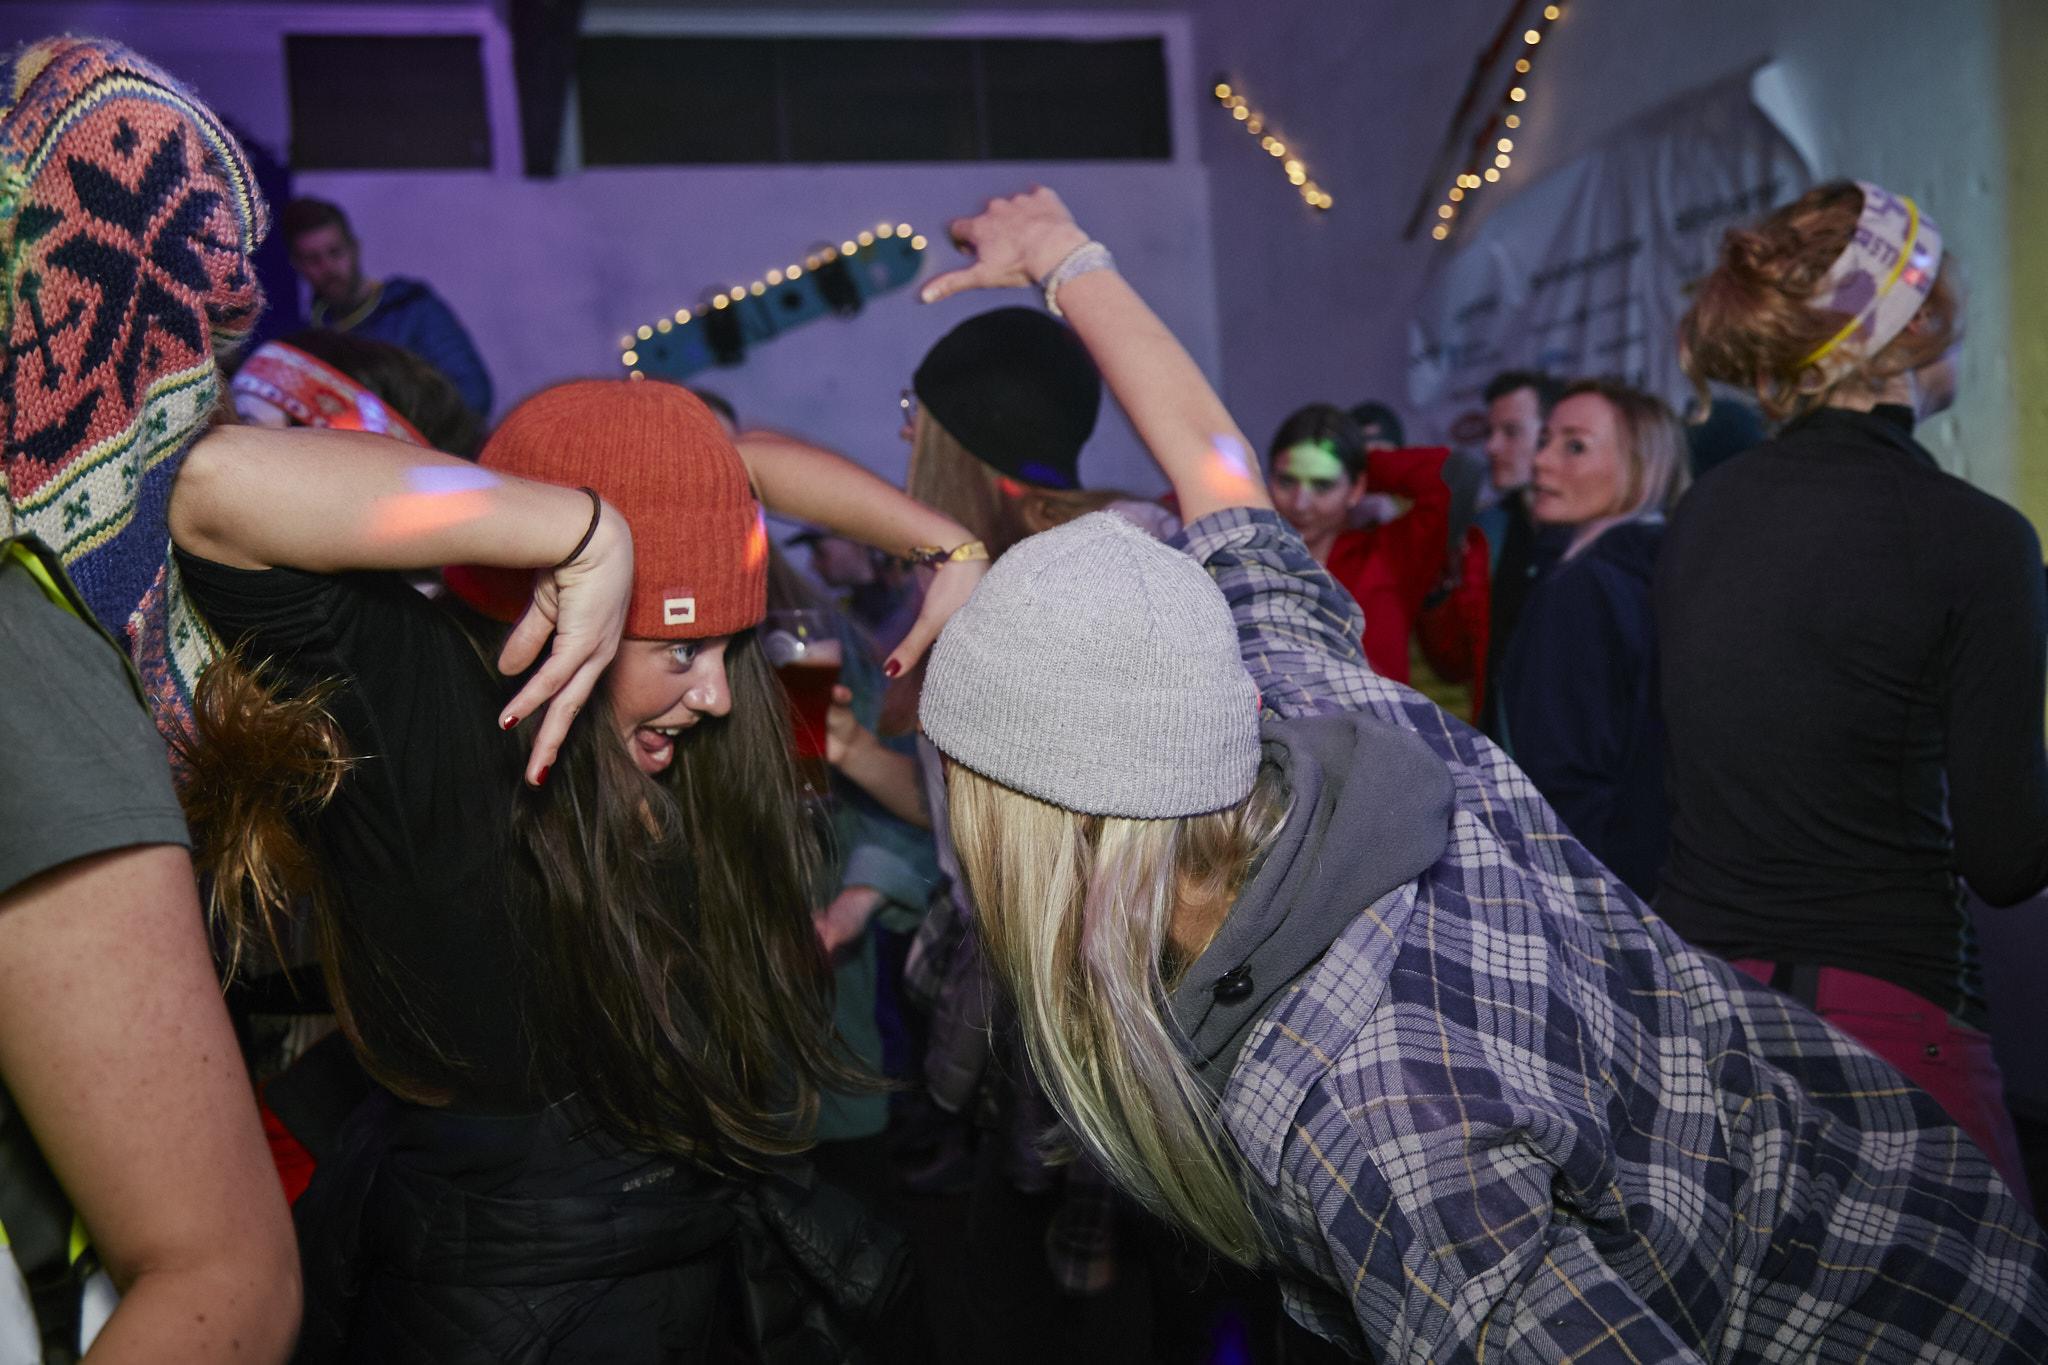 2018.02.22-Fjellsportfestival-Afterski-060.jpg